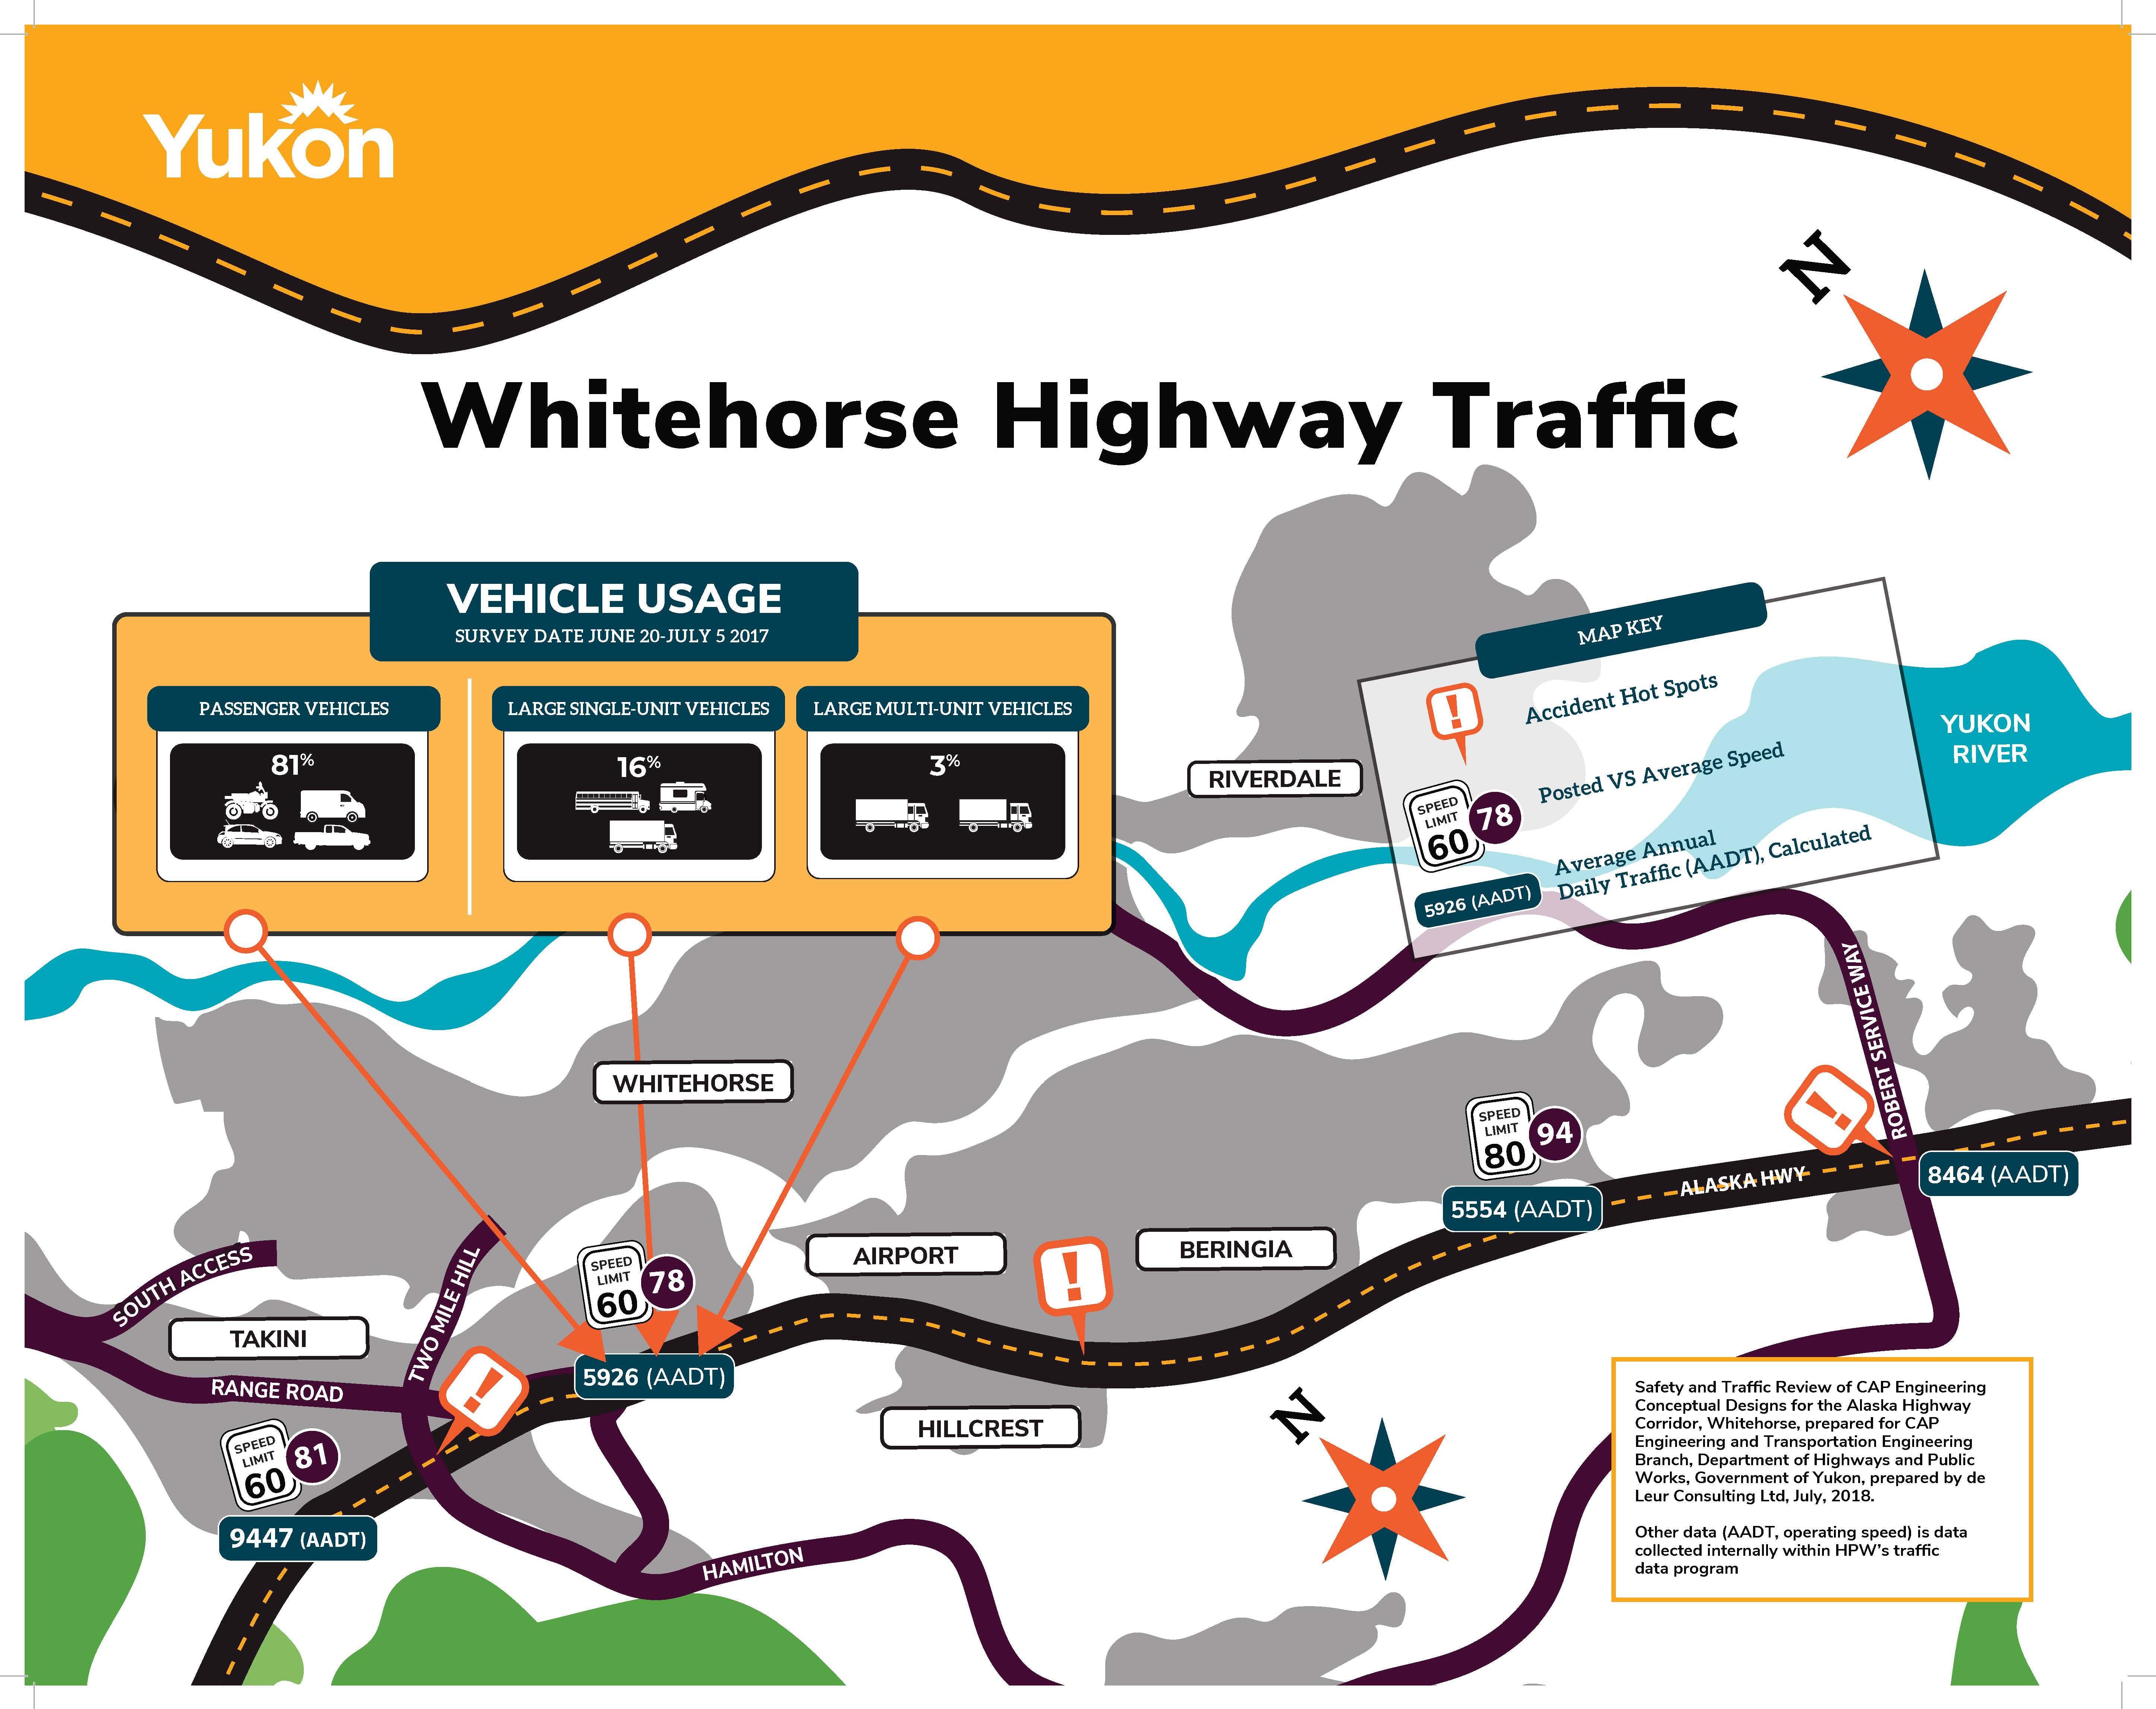 Range Road - Traffic Behavior